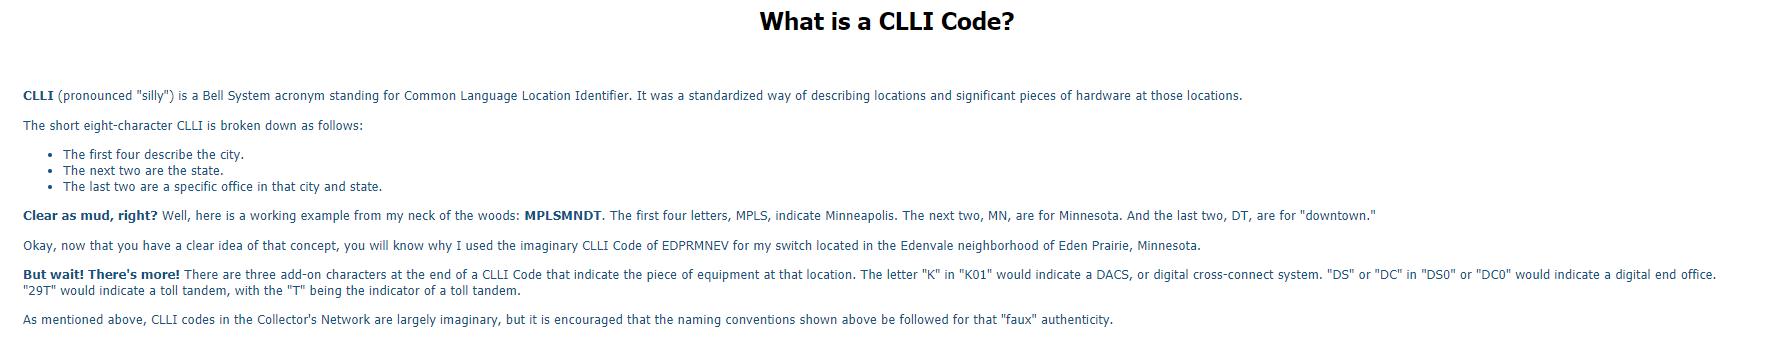 CLLI explaination